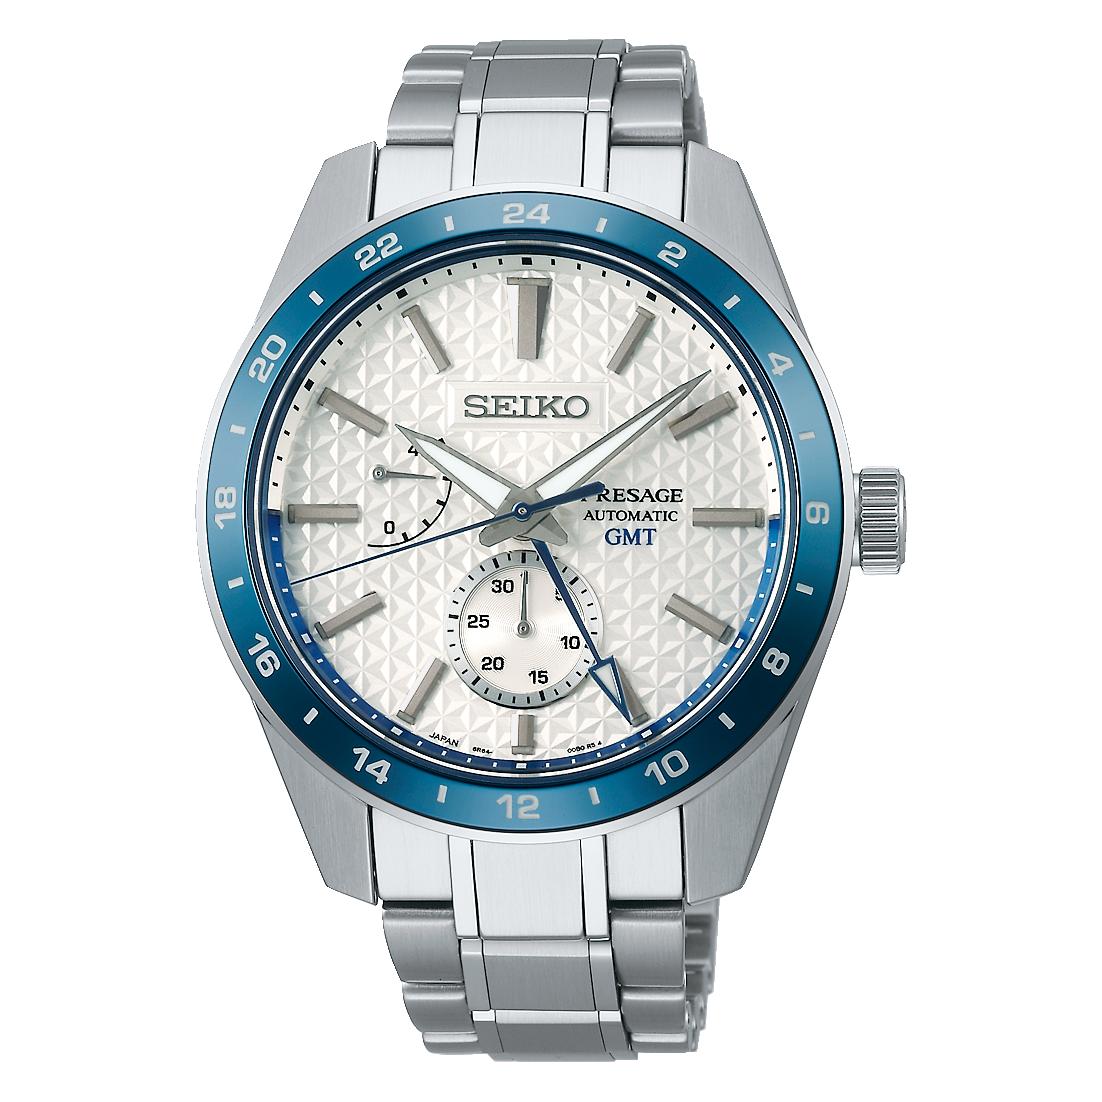 Orologio Seiko SPB223 J1